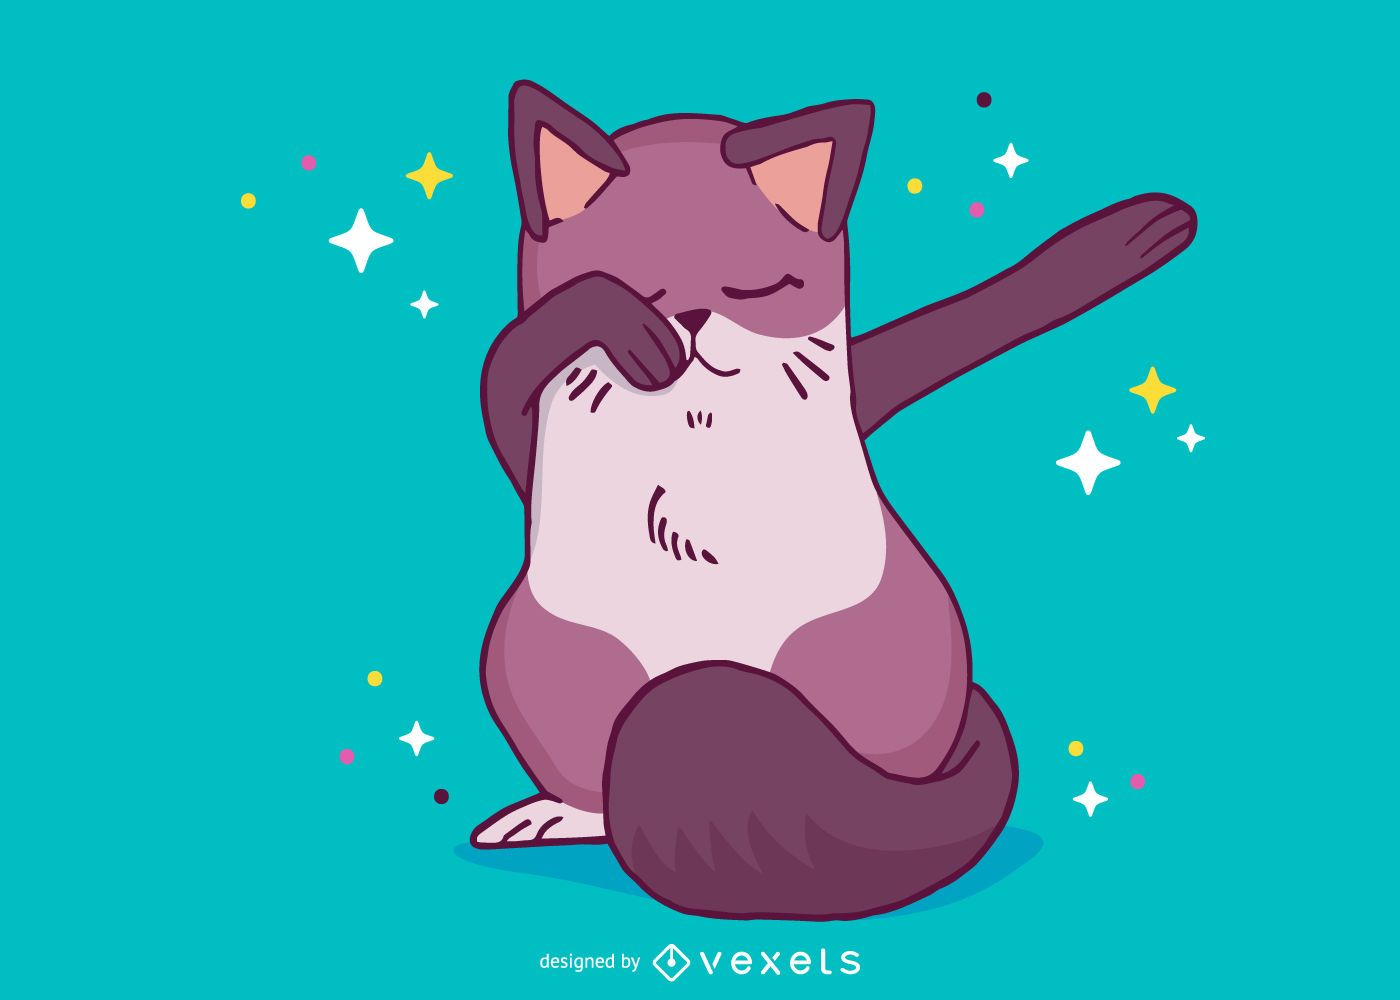 Dibujos animados de gato dabbing